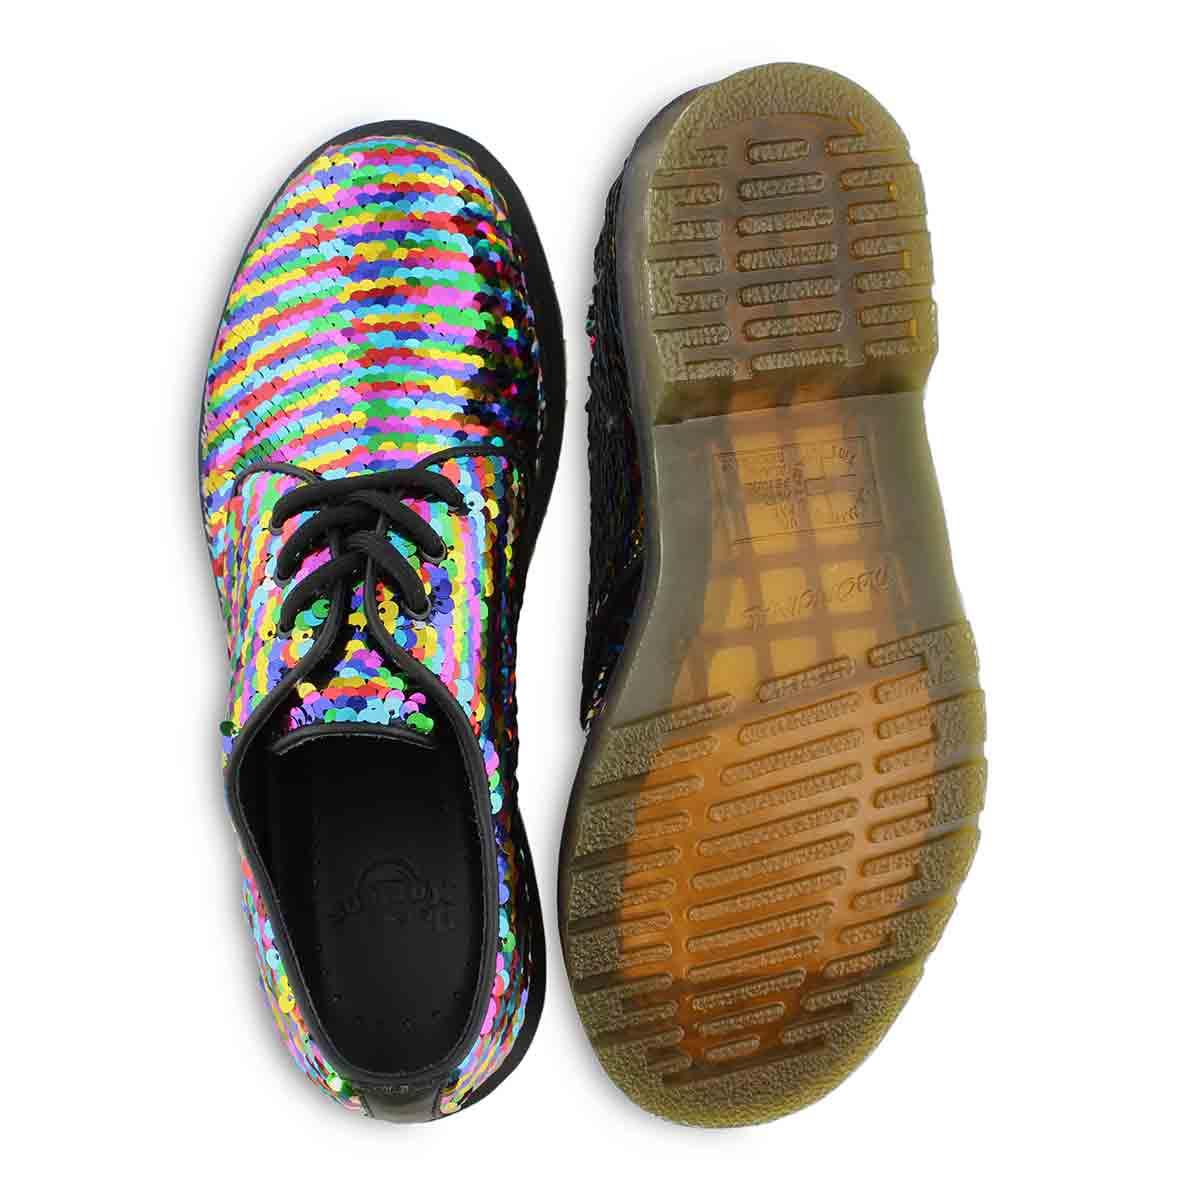 Lds 1461 Sequin rainbow 3 eye oxford